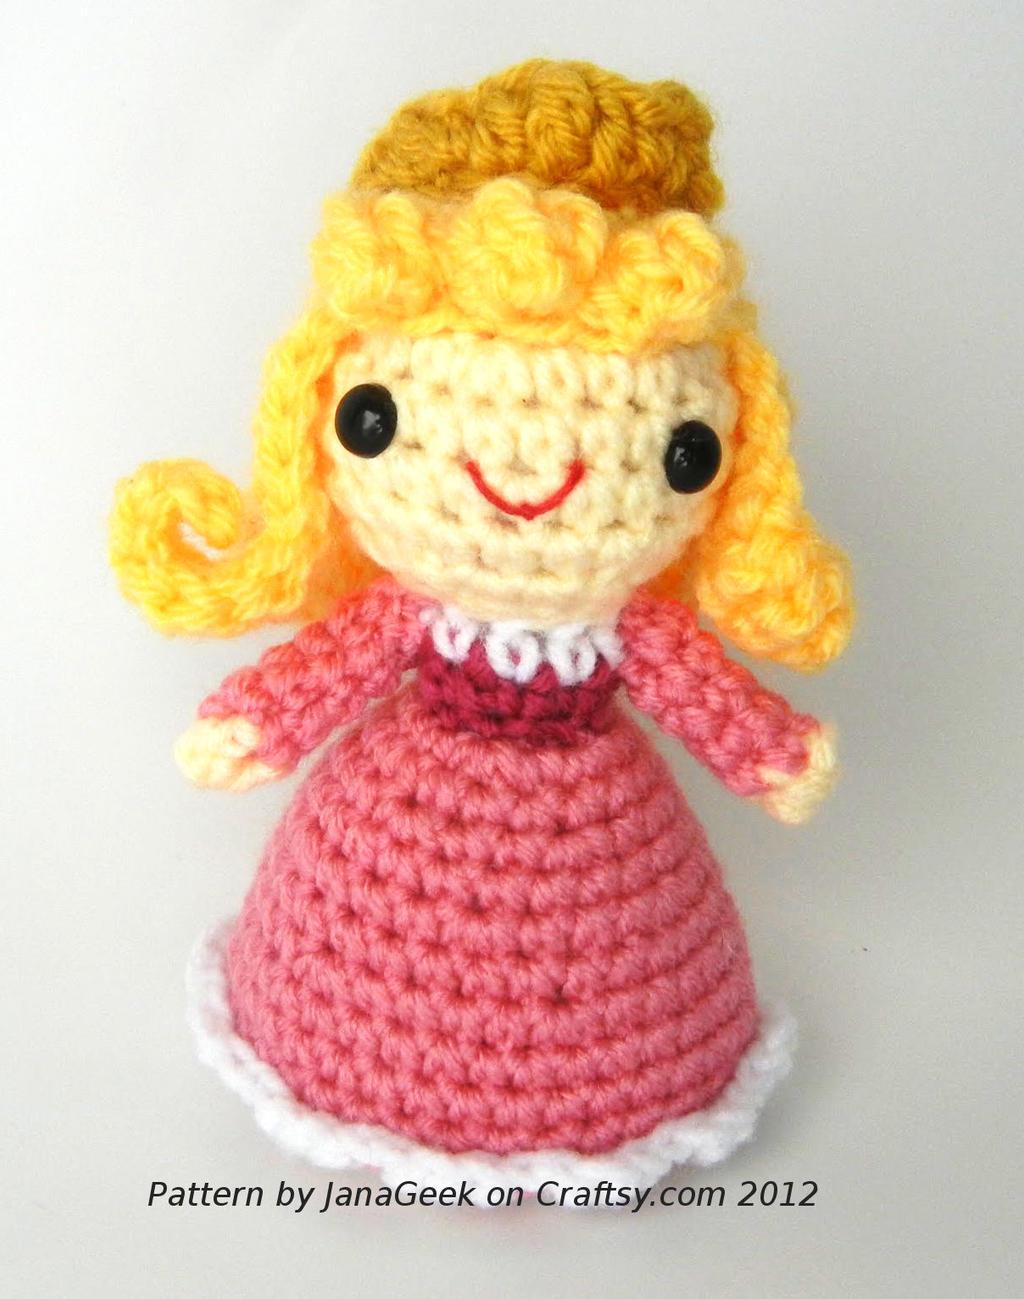 Crochet Patterns Amigurumi : Sleeping Beauty Aurora Amigurumi Crochet Pattern by janageek on ...